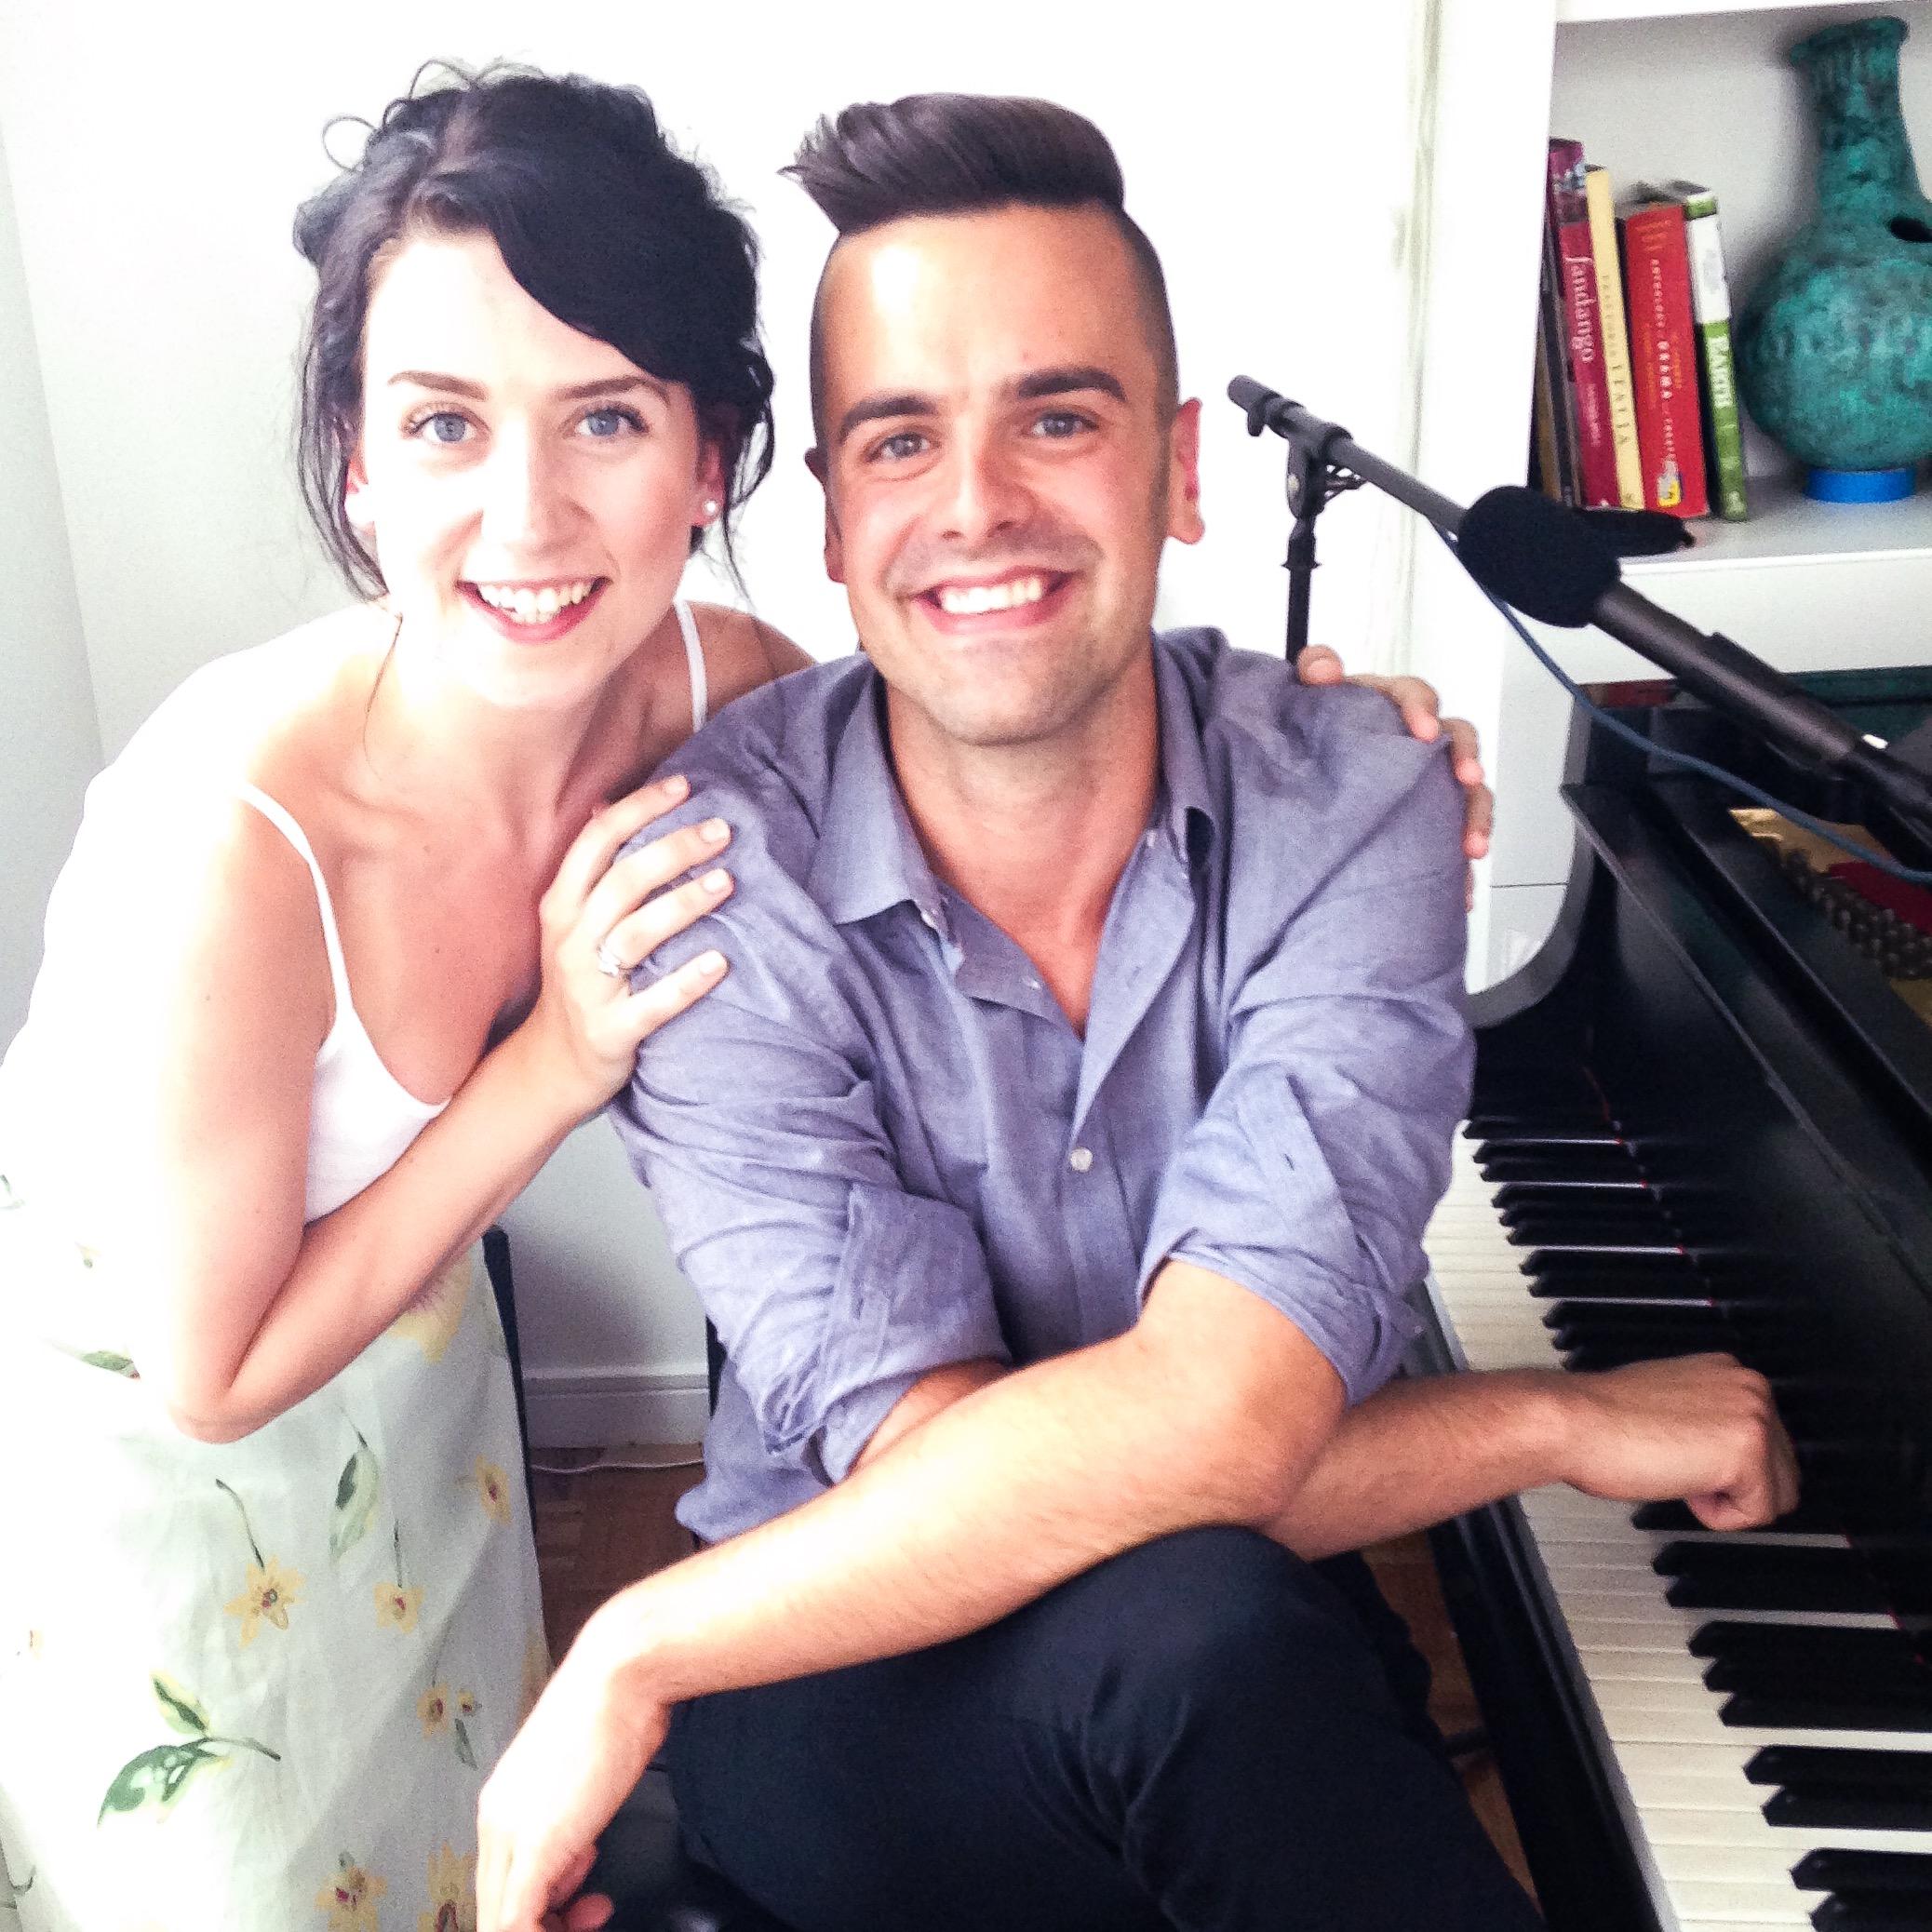 Michael J Moritz Jr and Danielle Hope